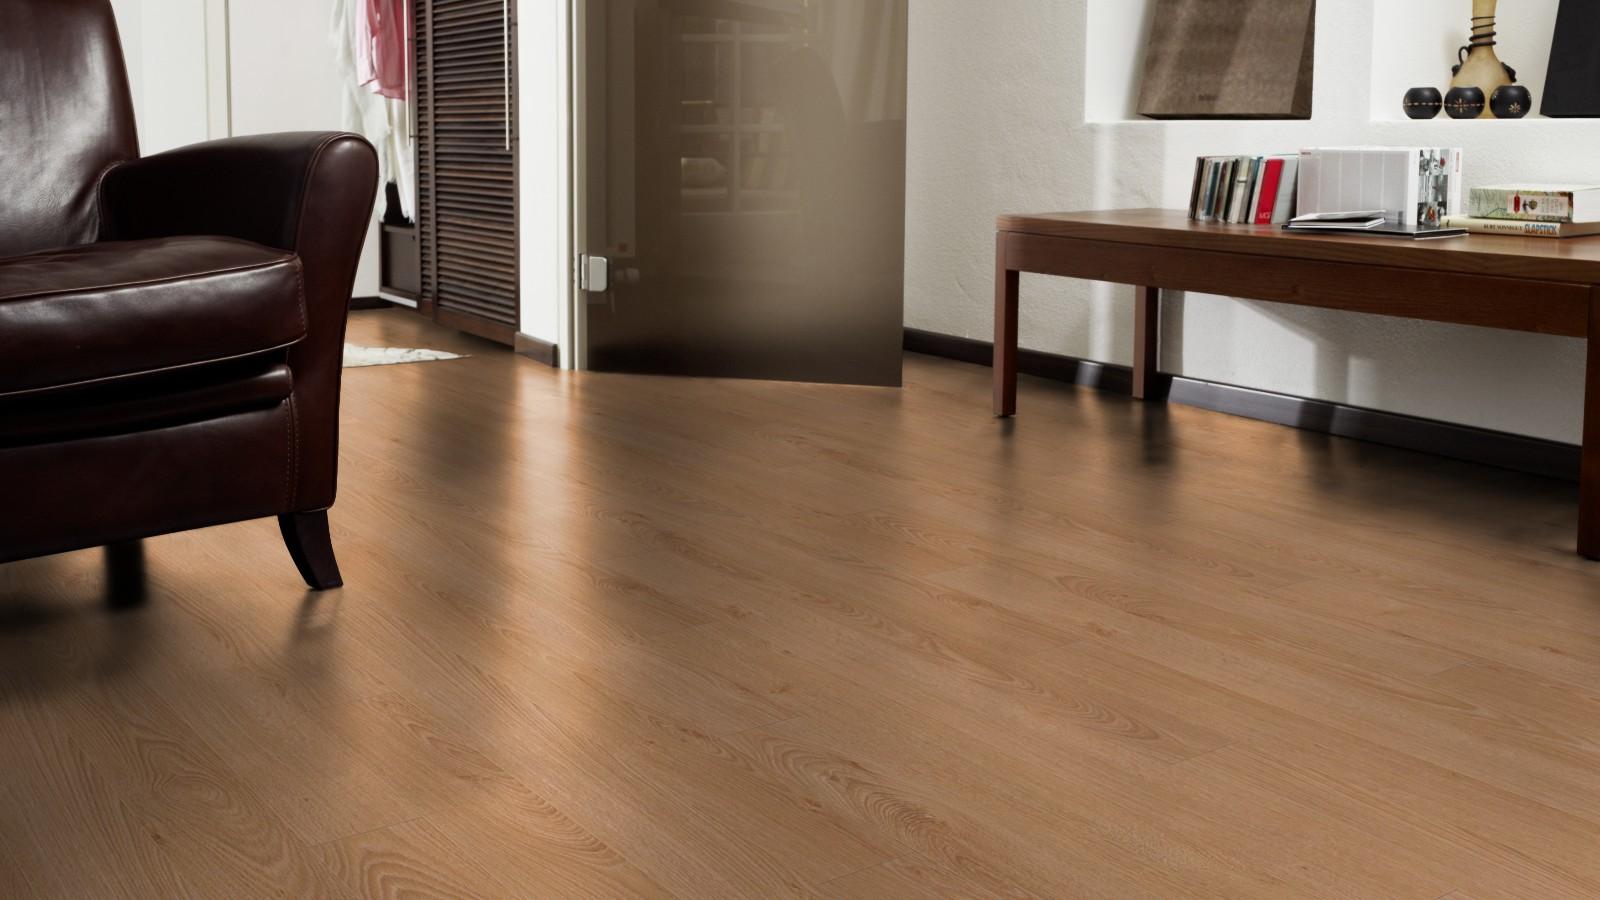 Seville Bedroom Set Kaindl Ventura 4 1 2 X 54 1 4 Brione Oak Flooring Hq Store